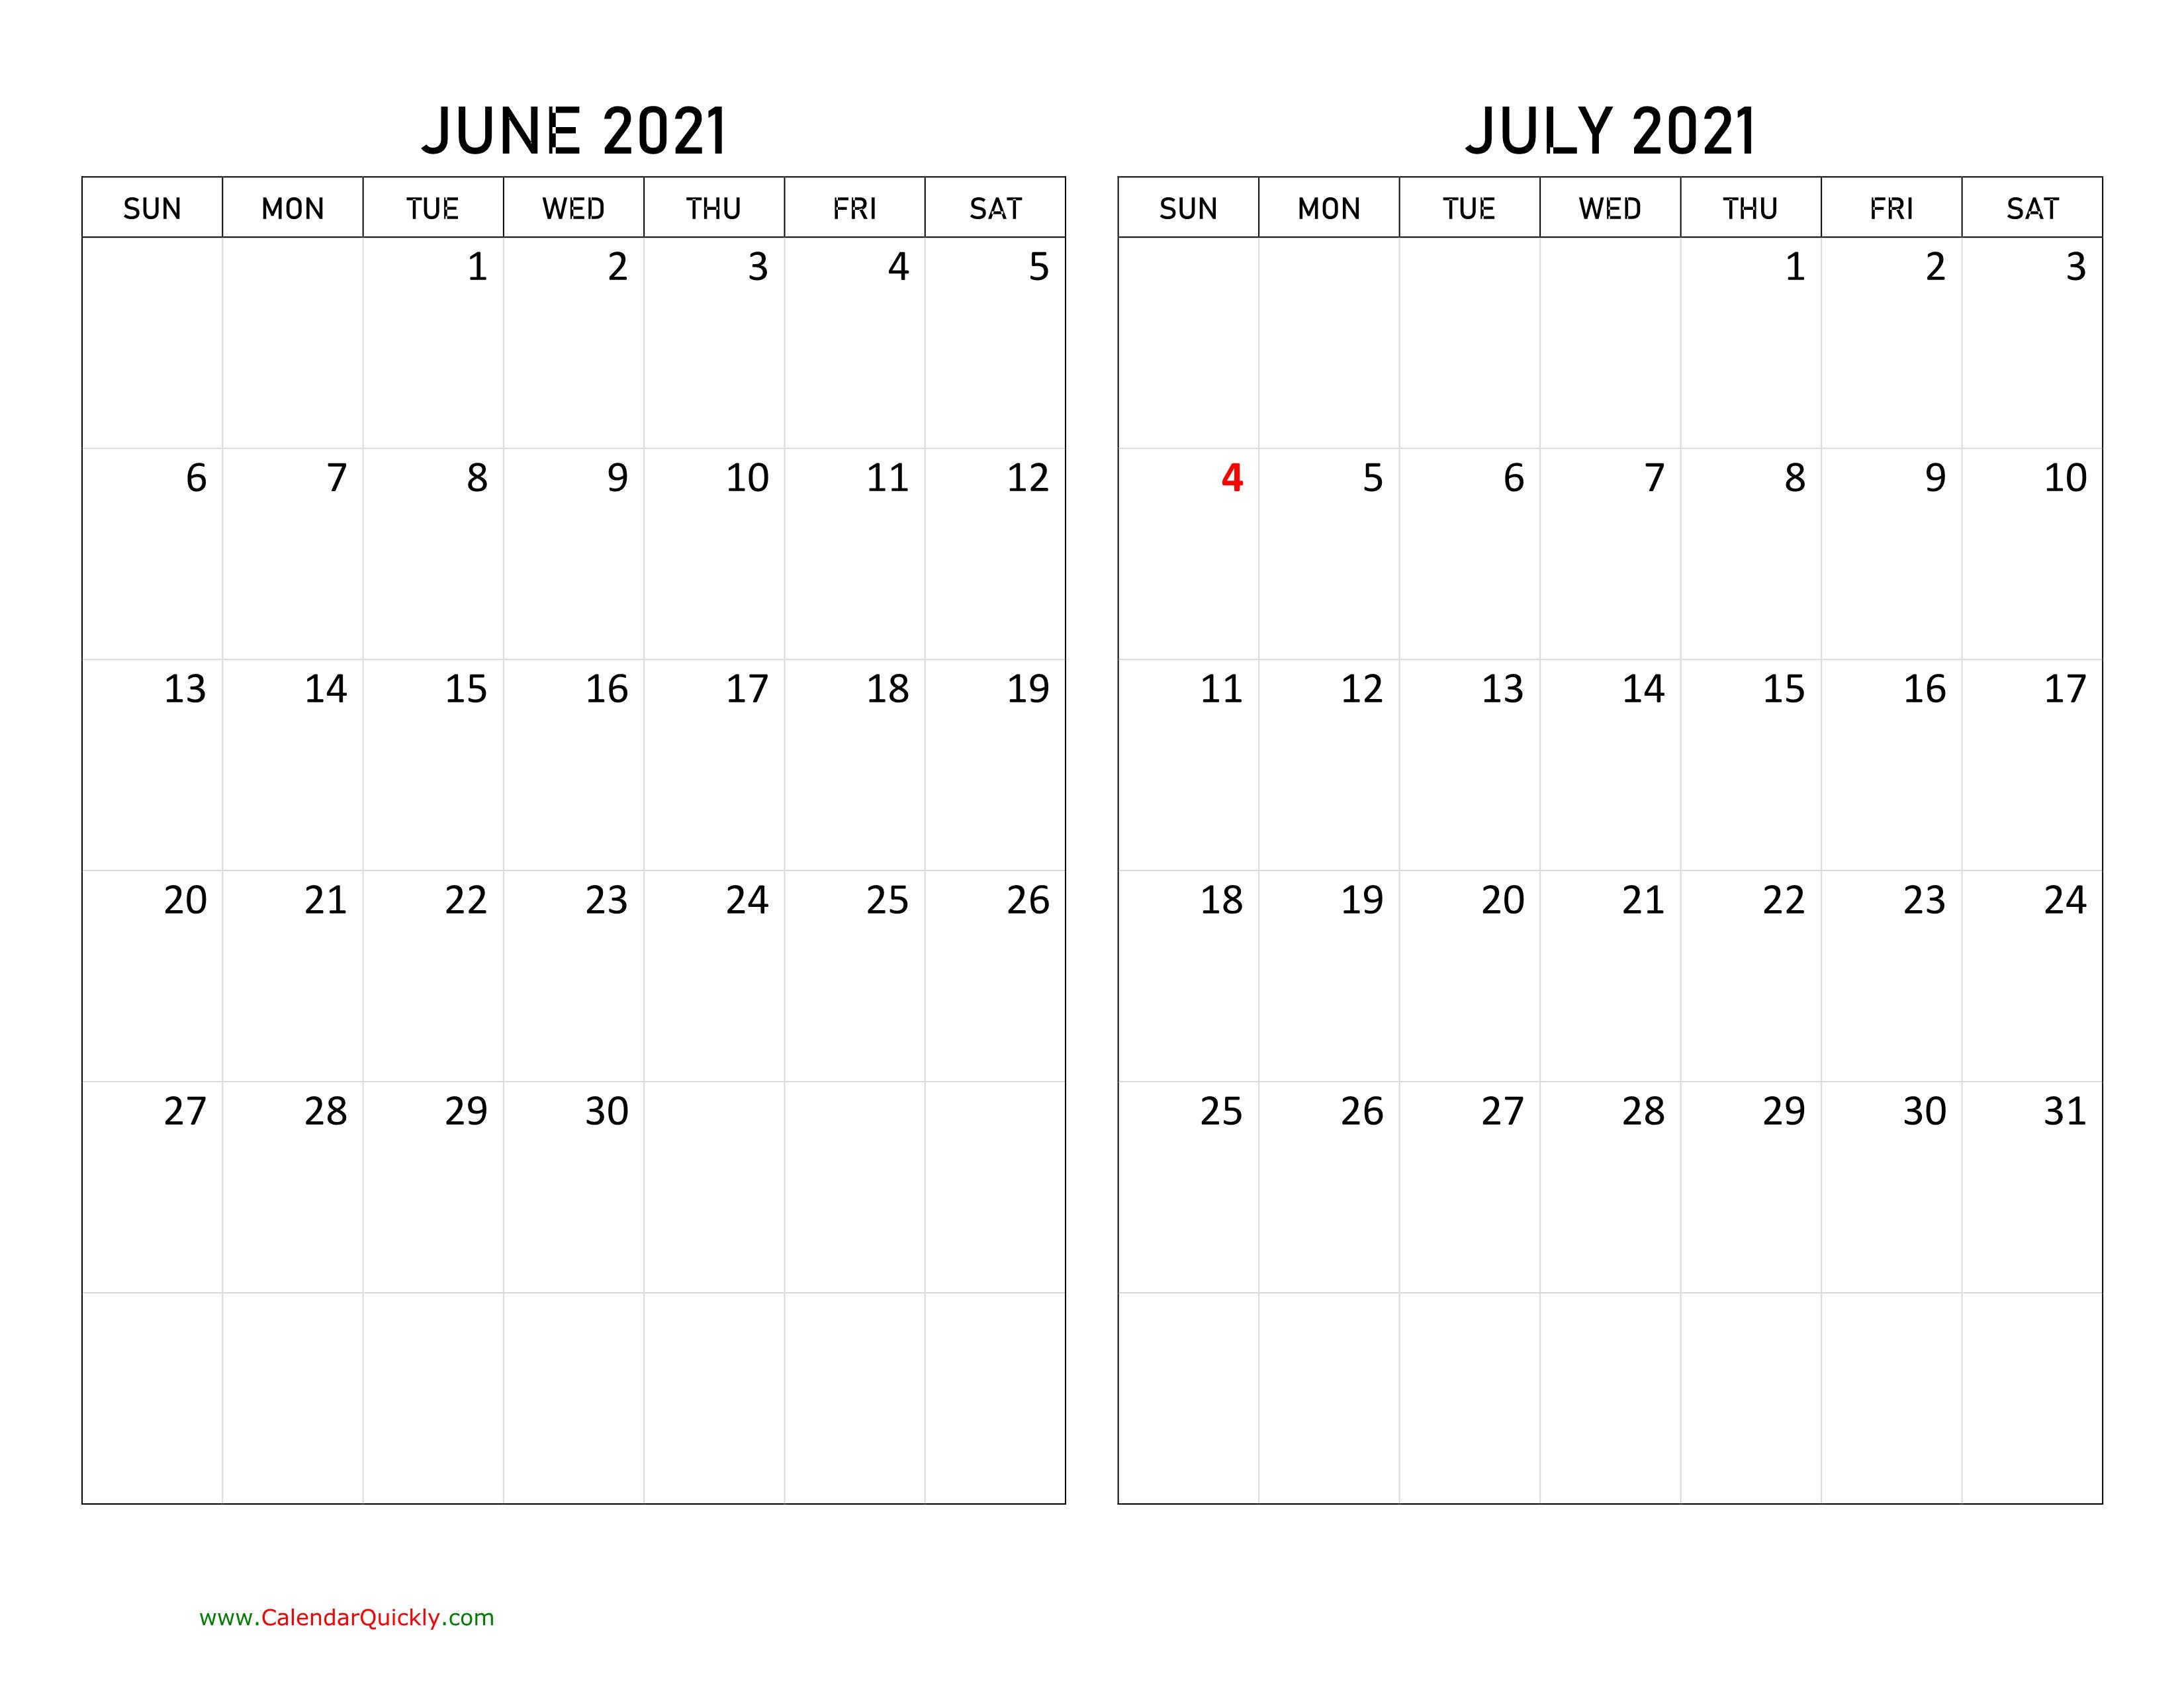 June And July 2021 Calendar   Calendar Quickly Printable Calendar June July August 2021